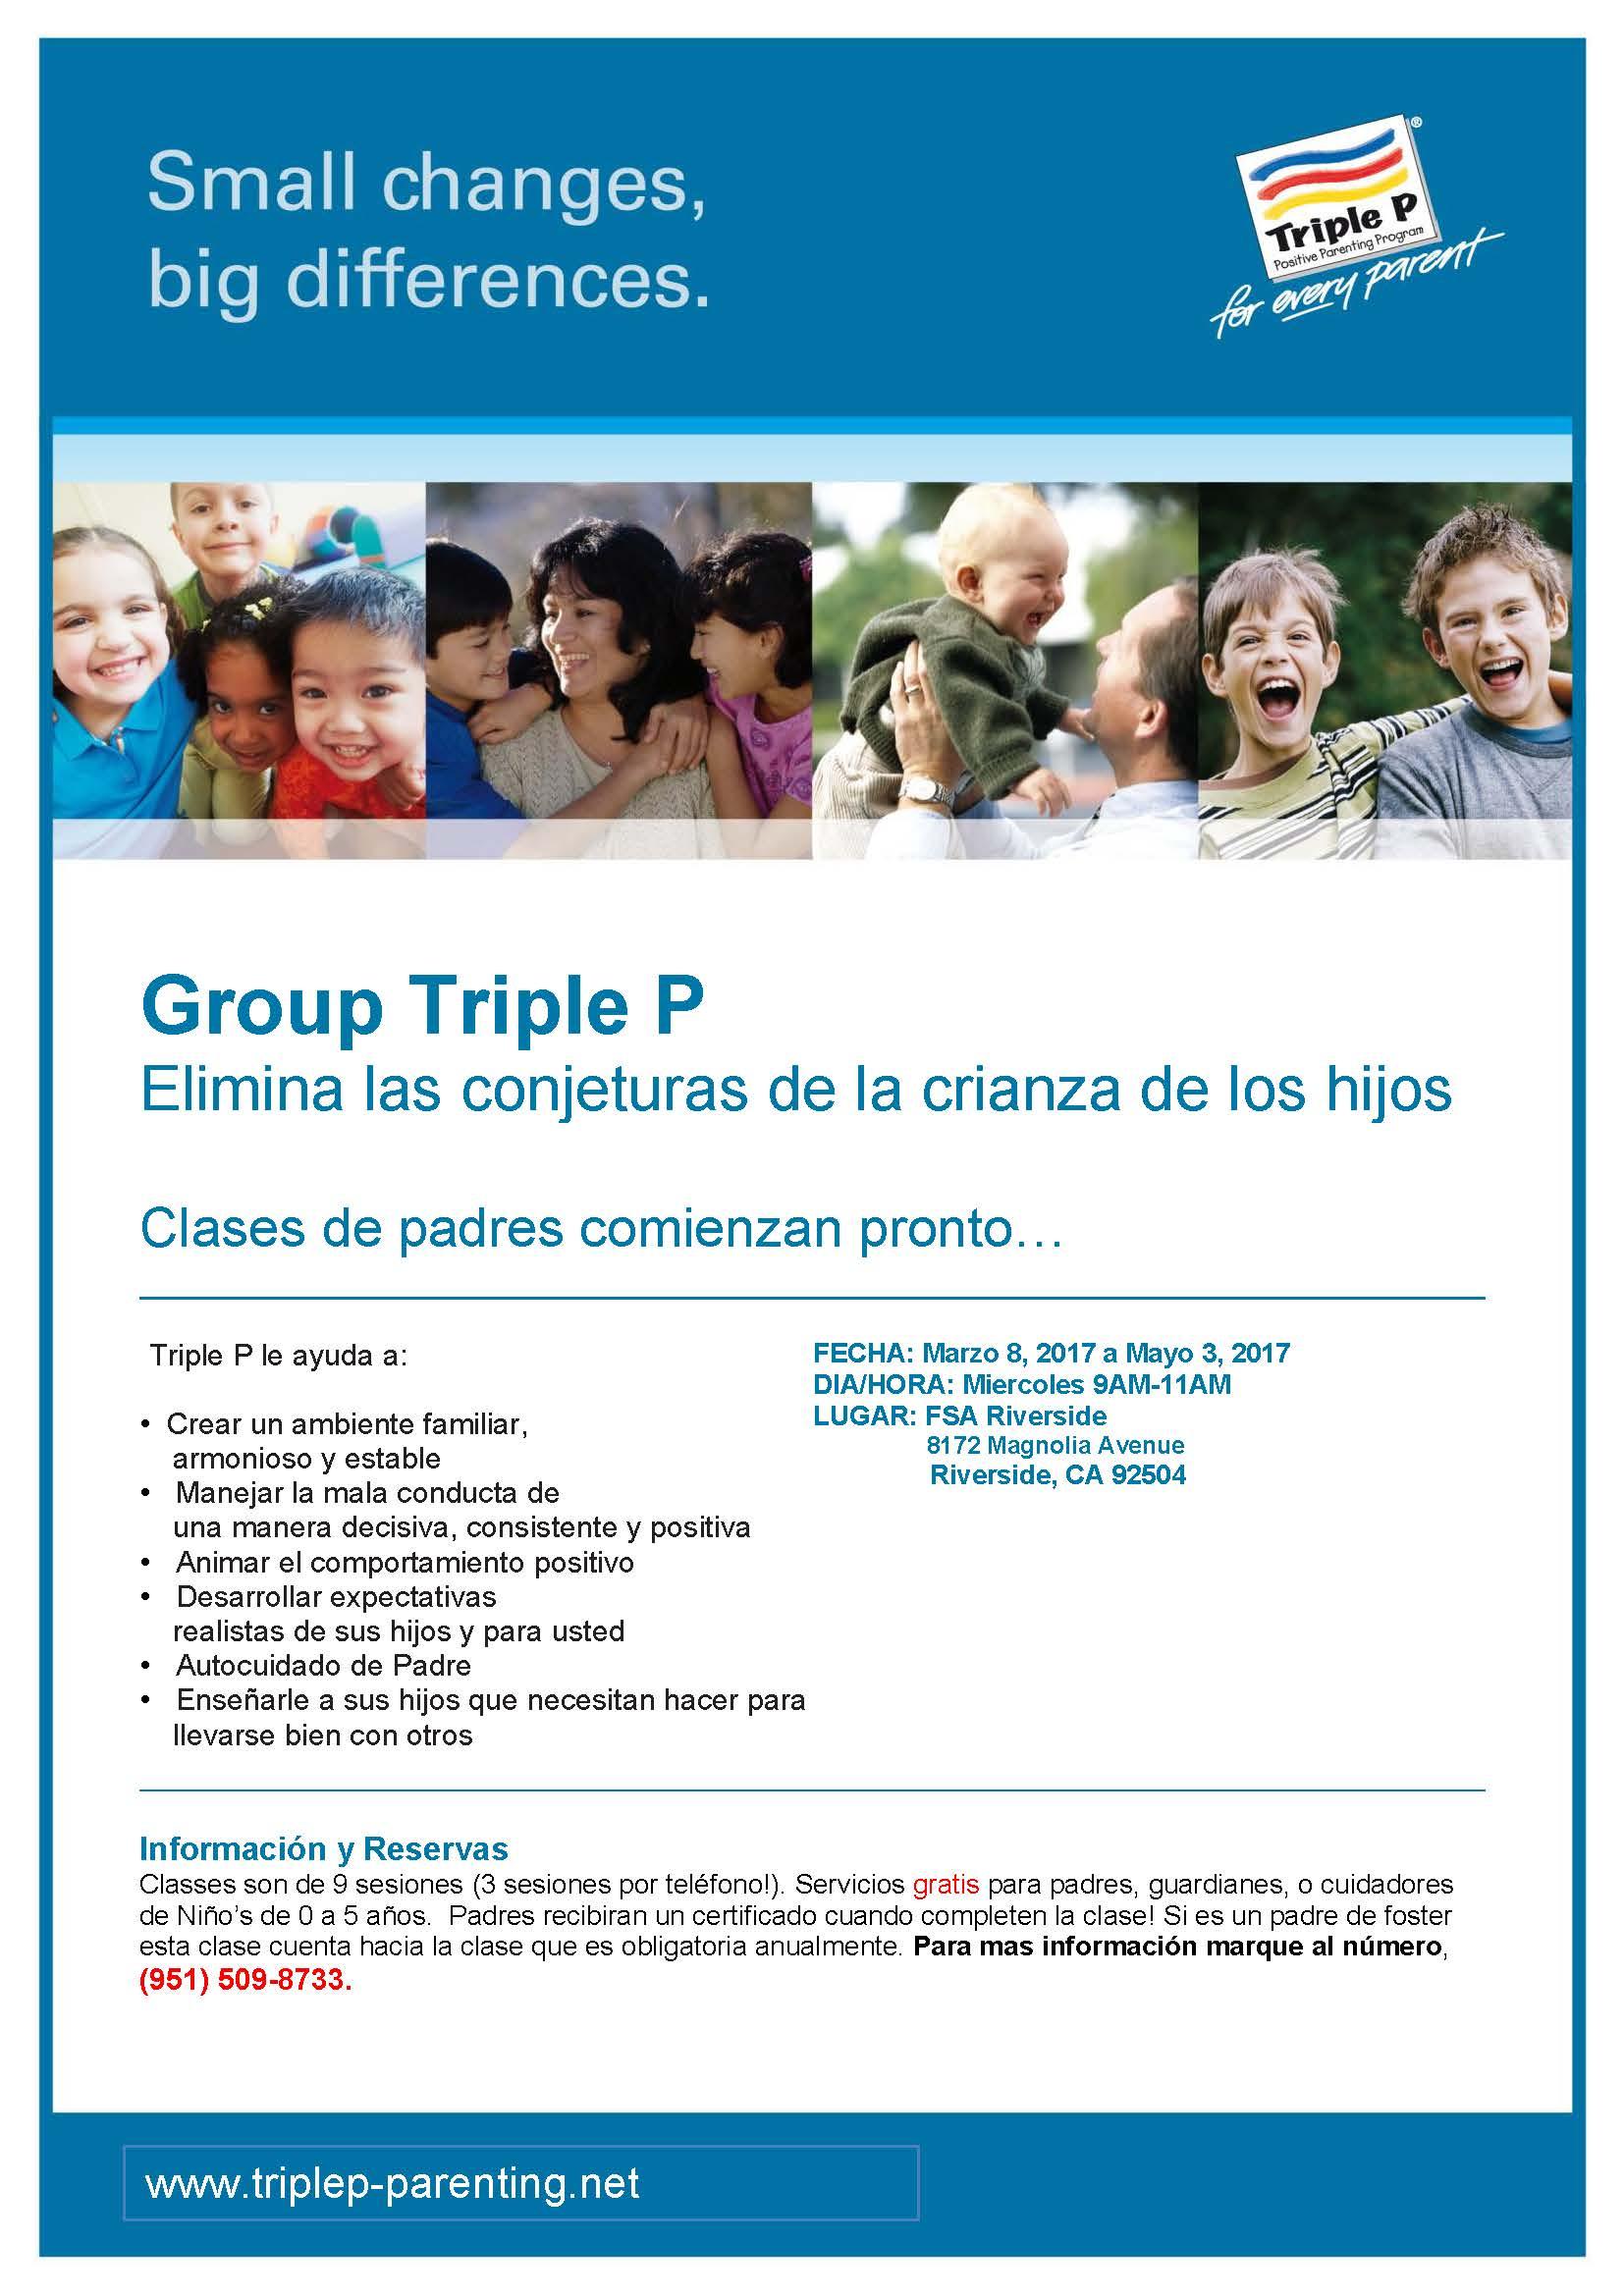 Group Triple P Flyer Spanish-Riverside March 2017.jpg